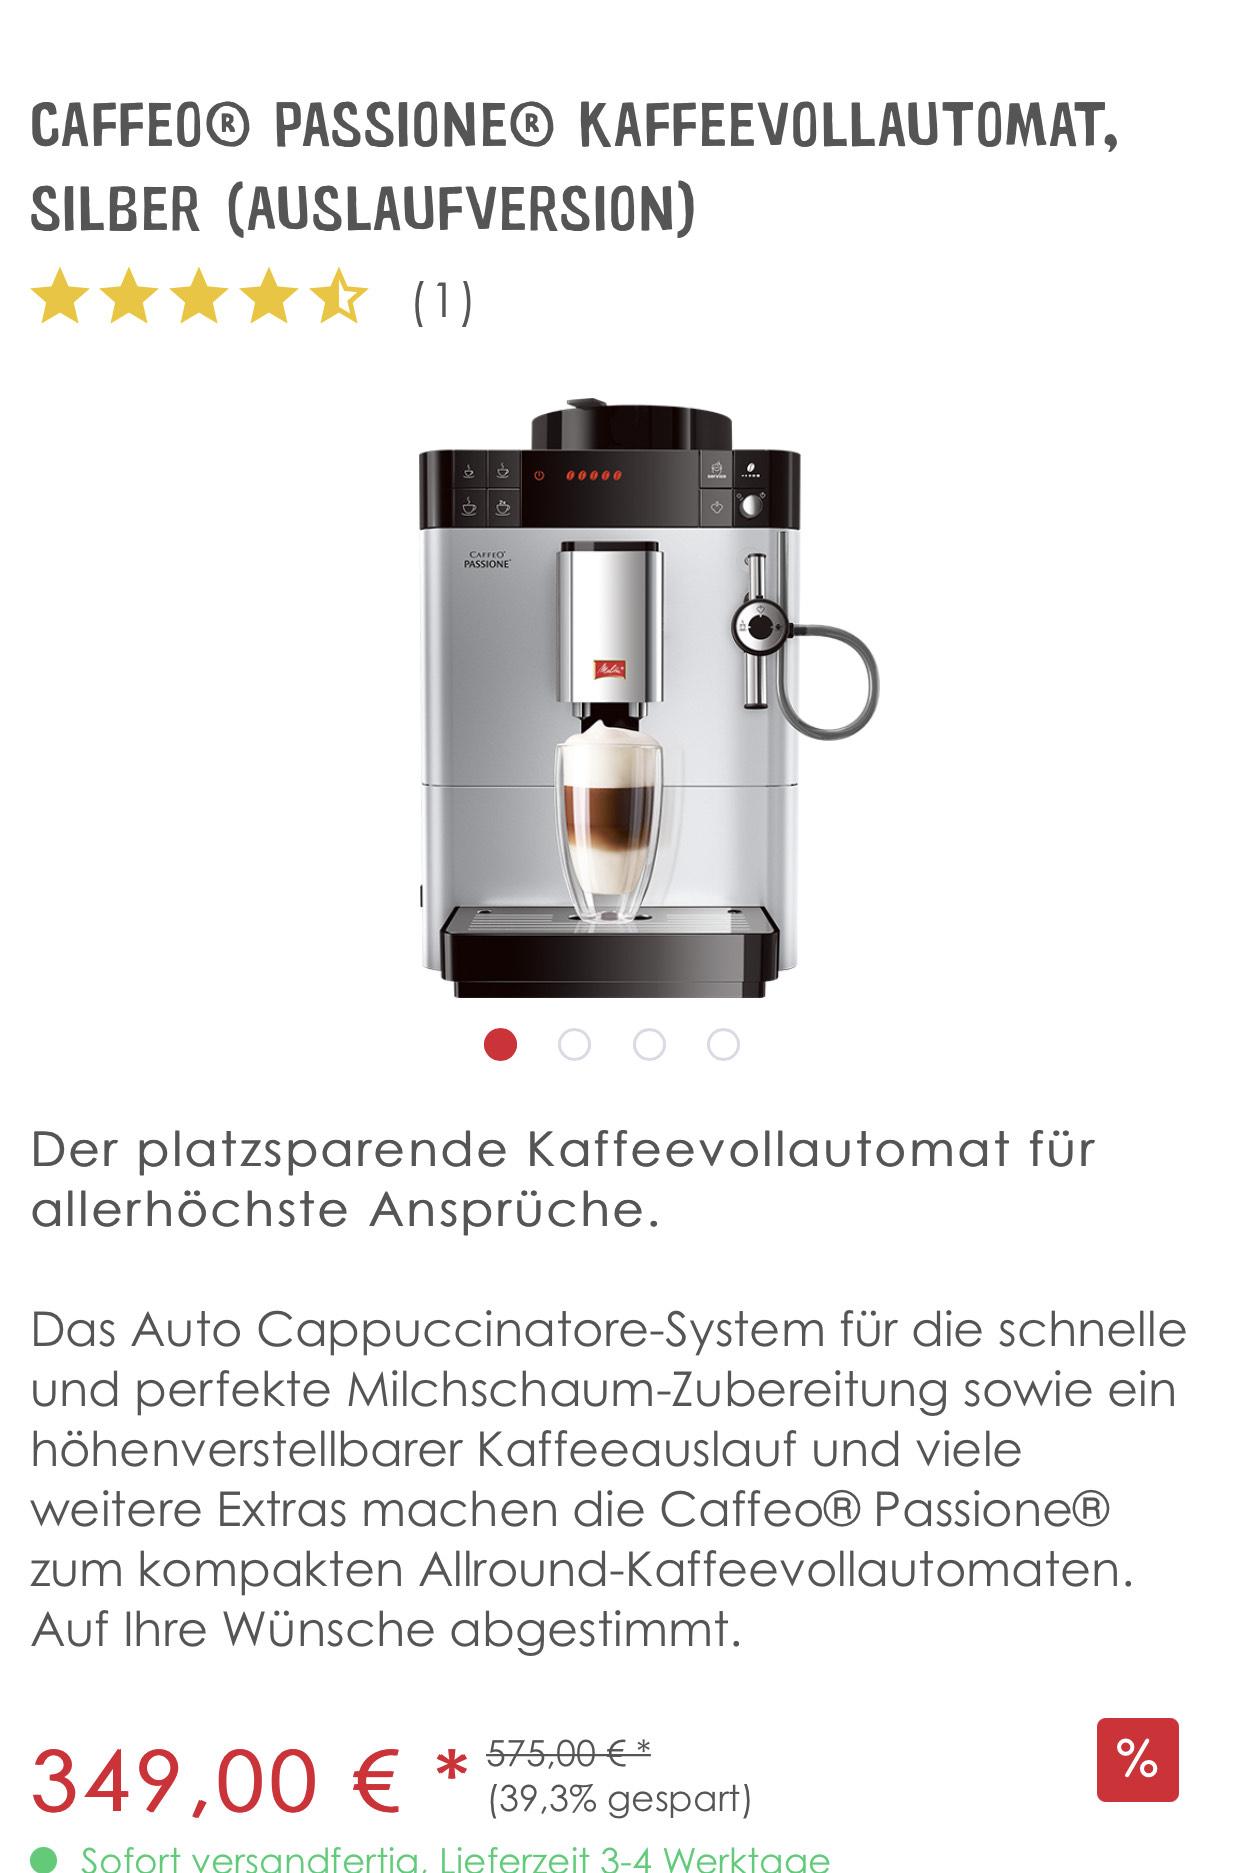 Caffeo® Passione® Kaffeevollautomat, silber (Auslaufversion)